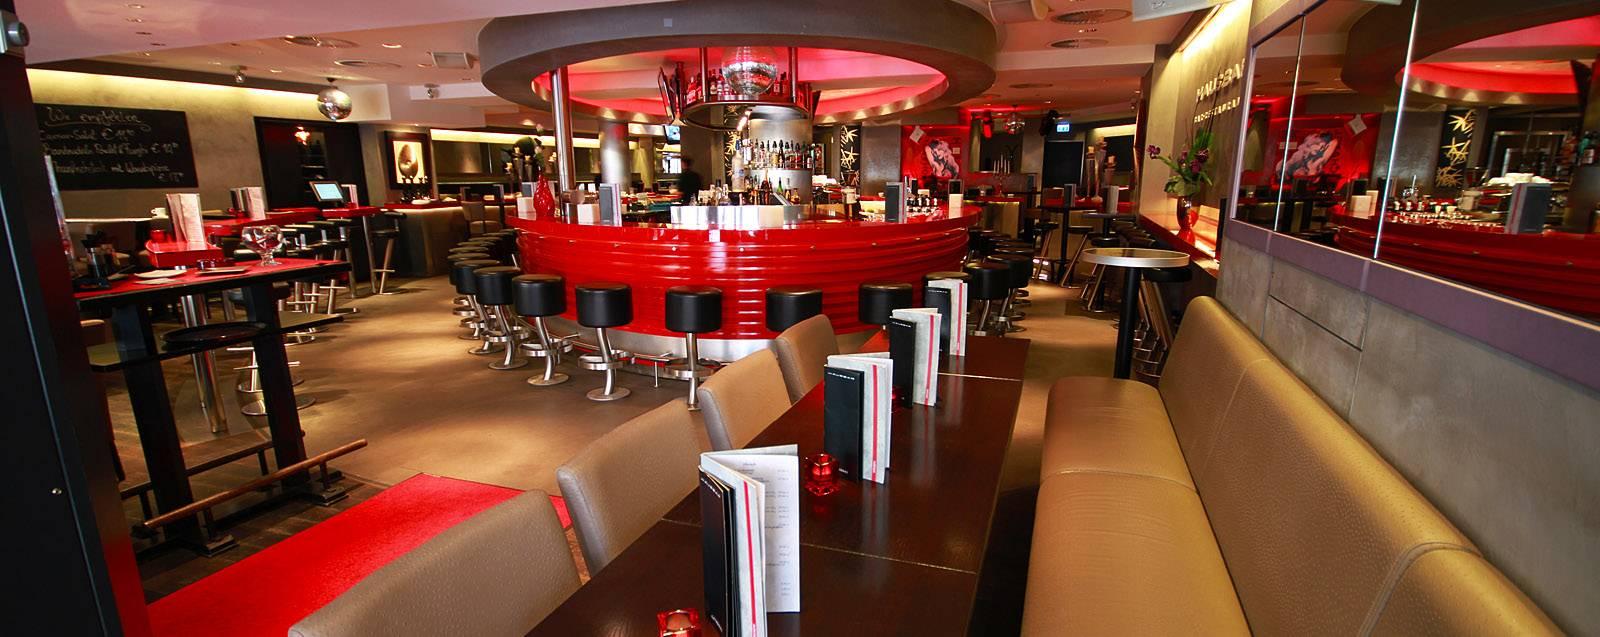 Hausbar Düsseldorf cuisine rayani immobilien e k